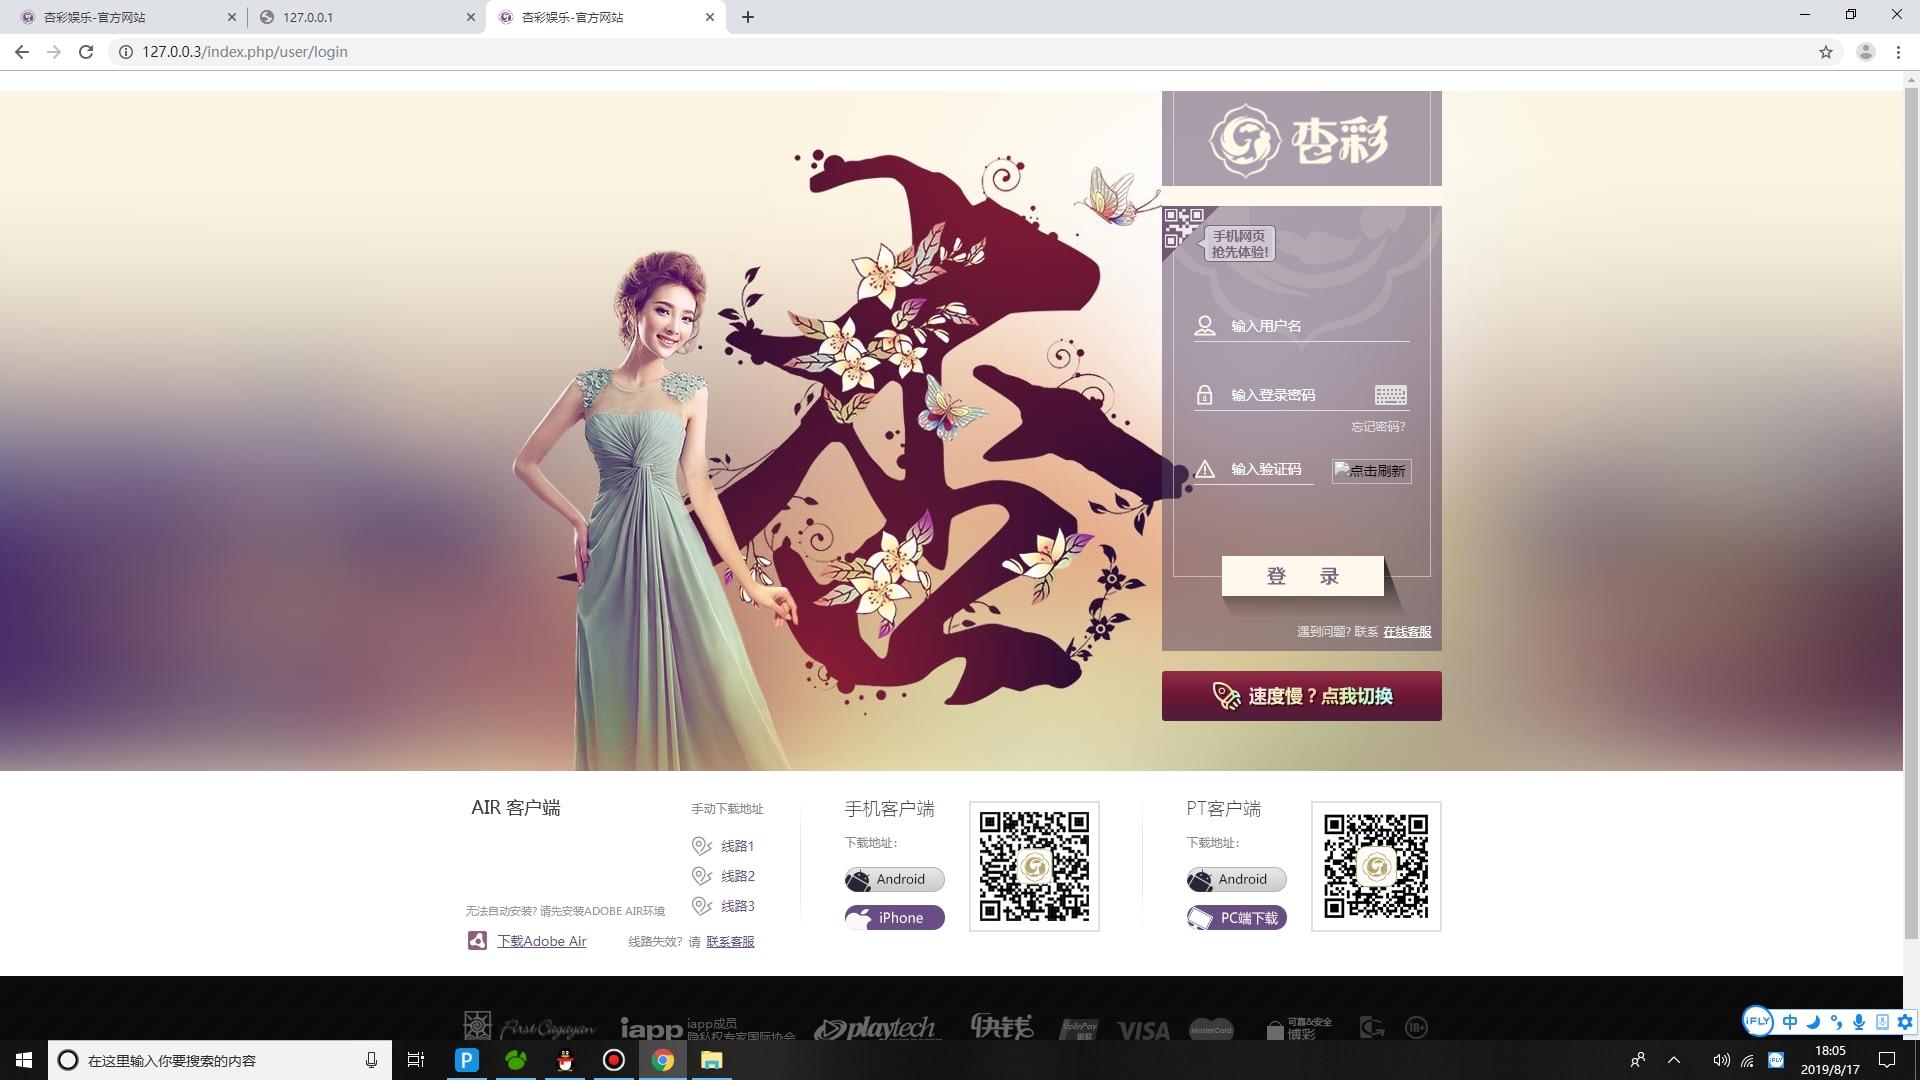 PHP新杏彩34彩票网站源码带手机WAP版(手把手搭建教程)